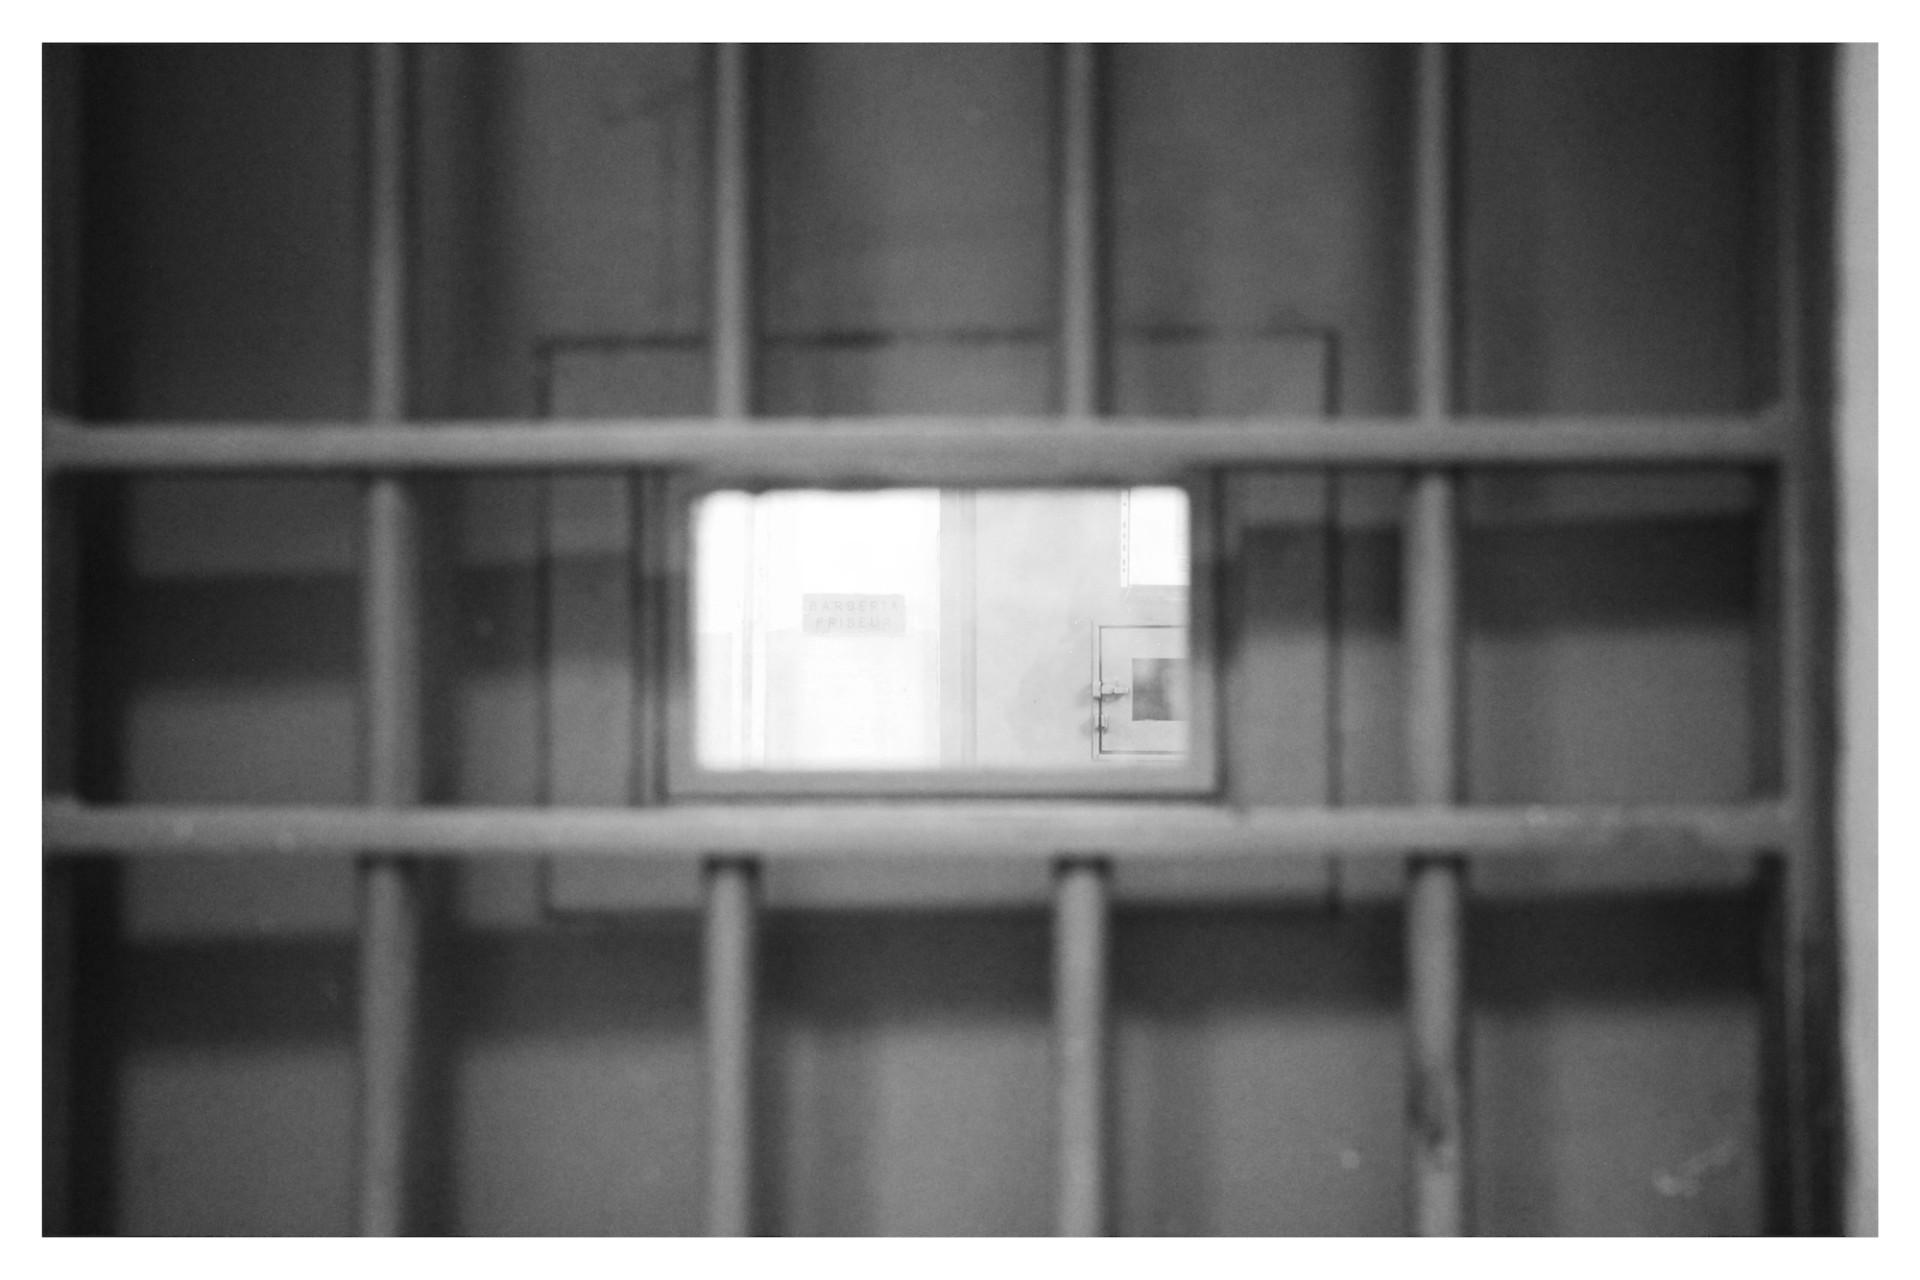 Nicolò Degiorgis Prison Photography, 2013-2018